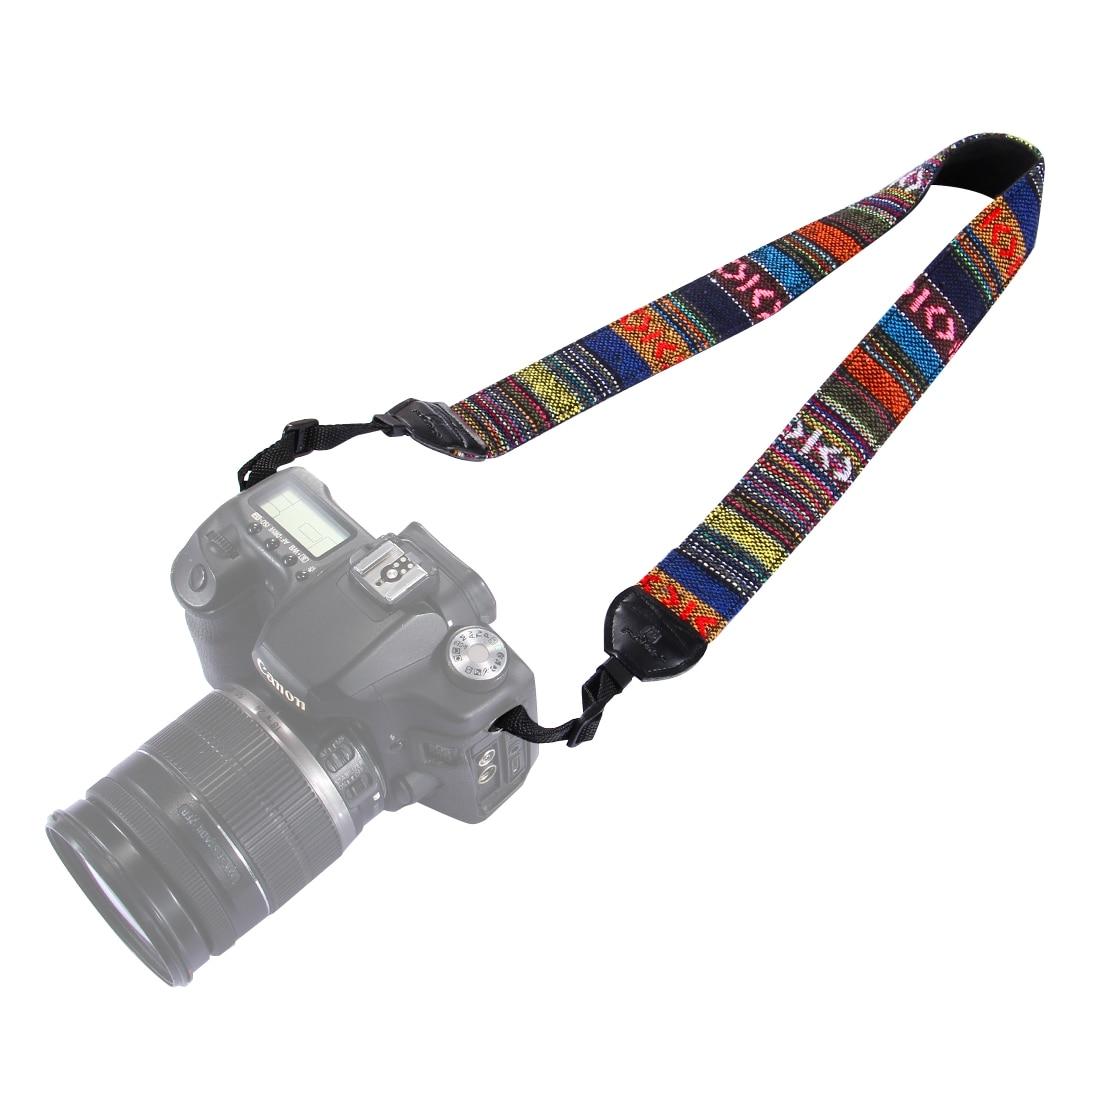 PULUZ PU6007B Retro Ethnic Style Multi-color Series Shoulder Neck Strap Camera Strap for SLR DSLR Camera Photography Accessories